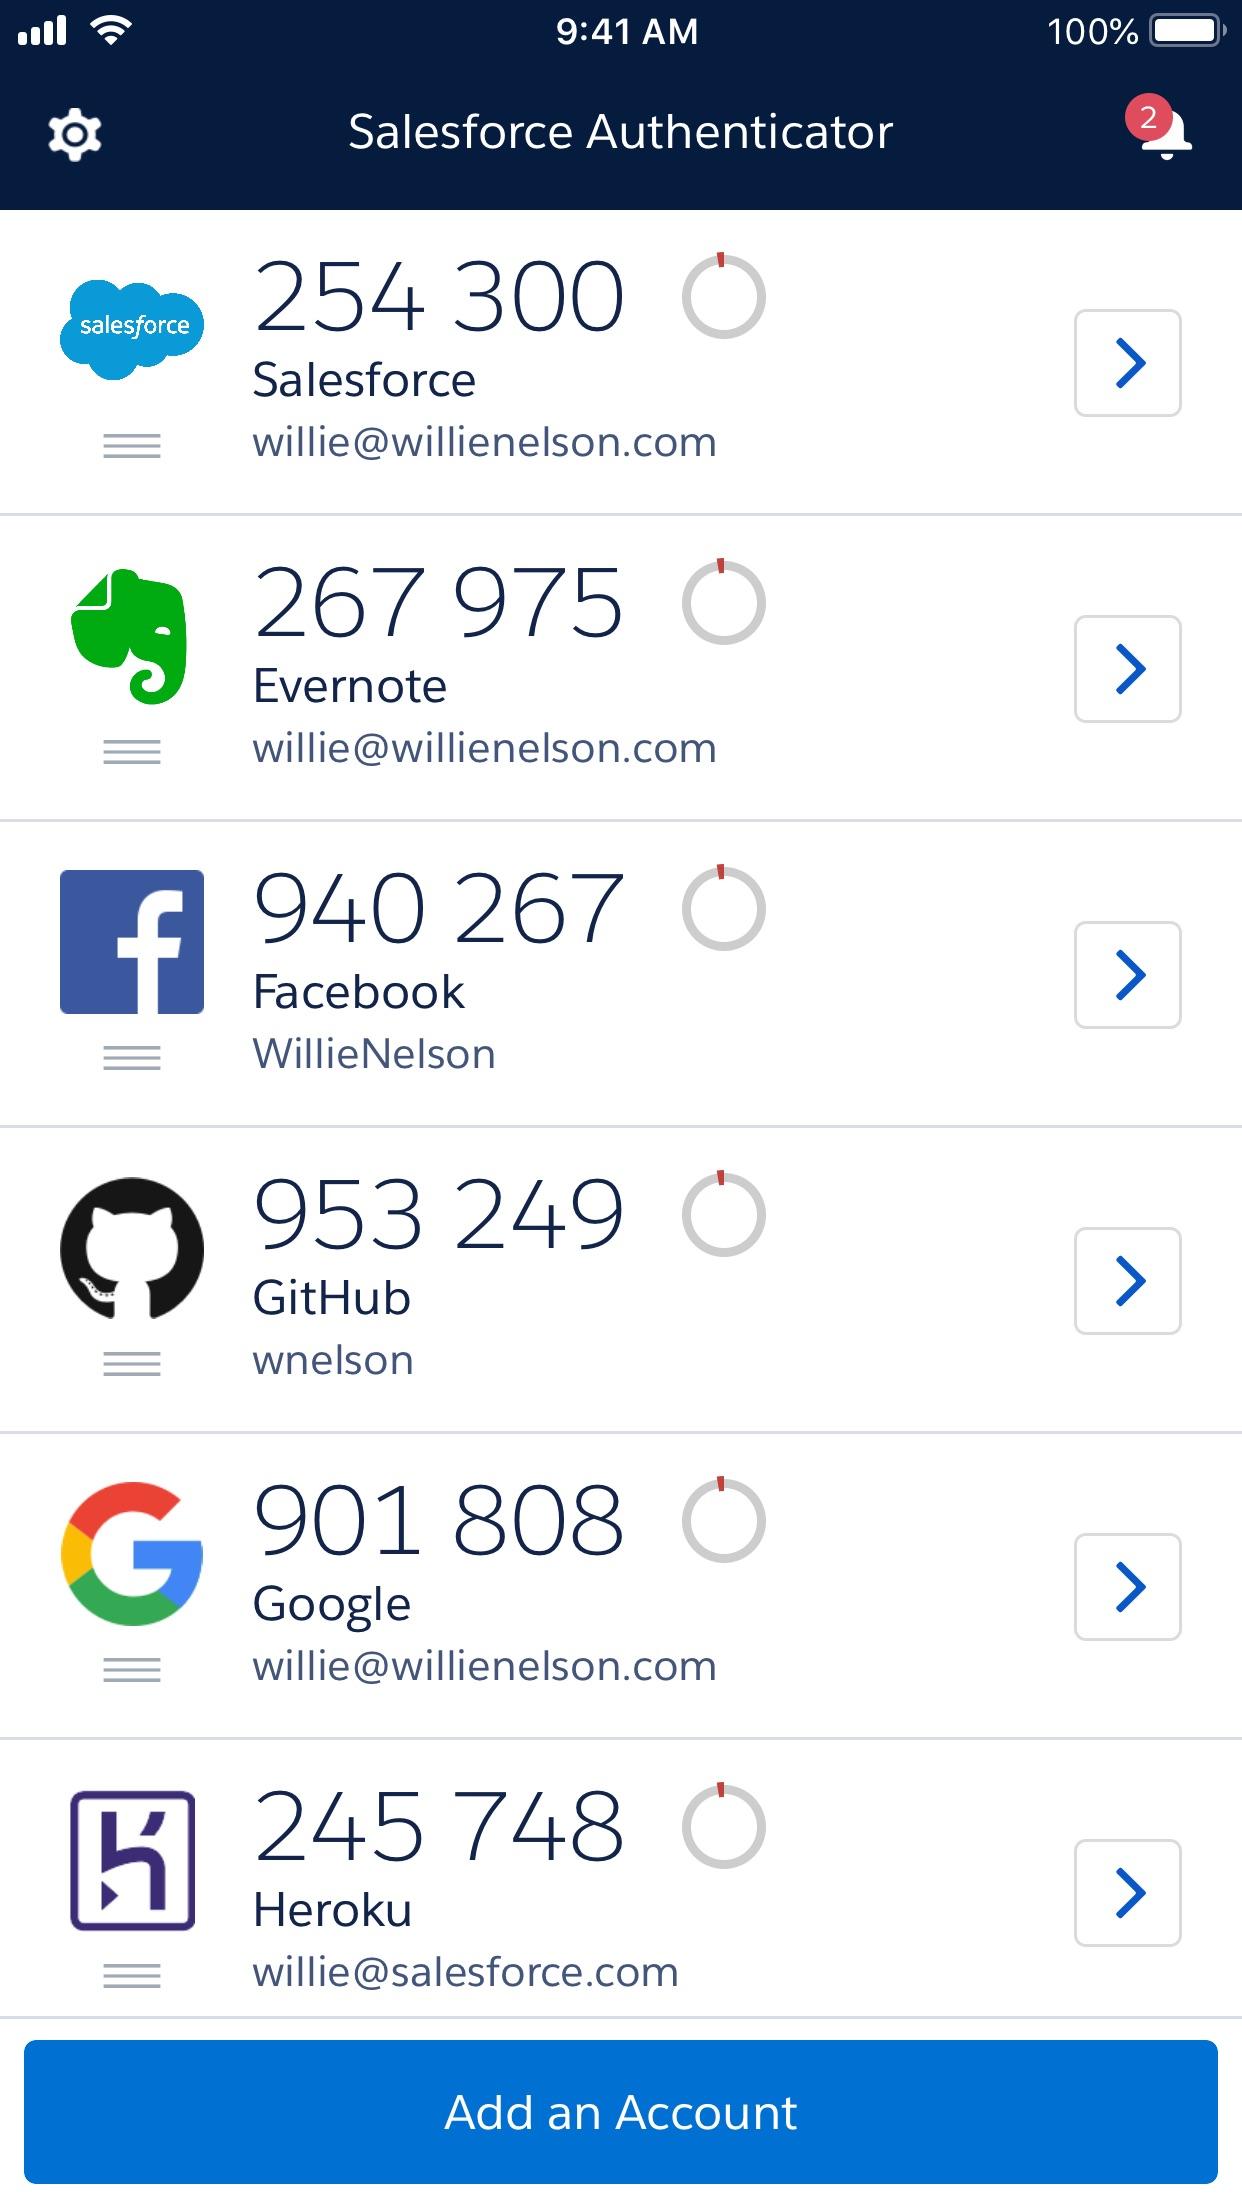 Salesforce Authenticator Screenshot